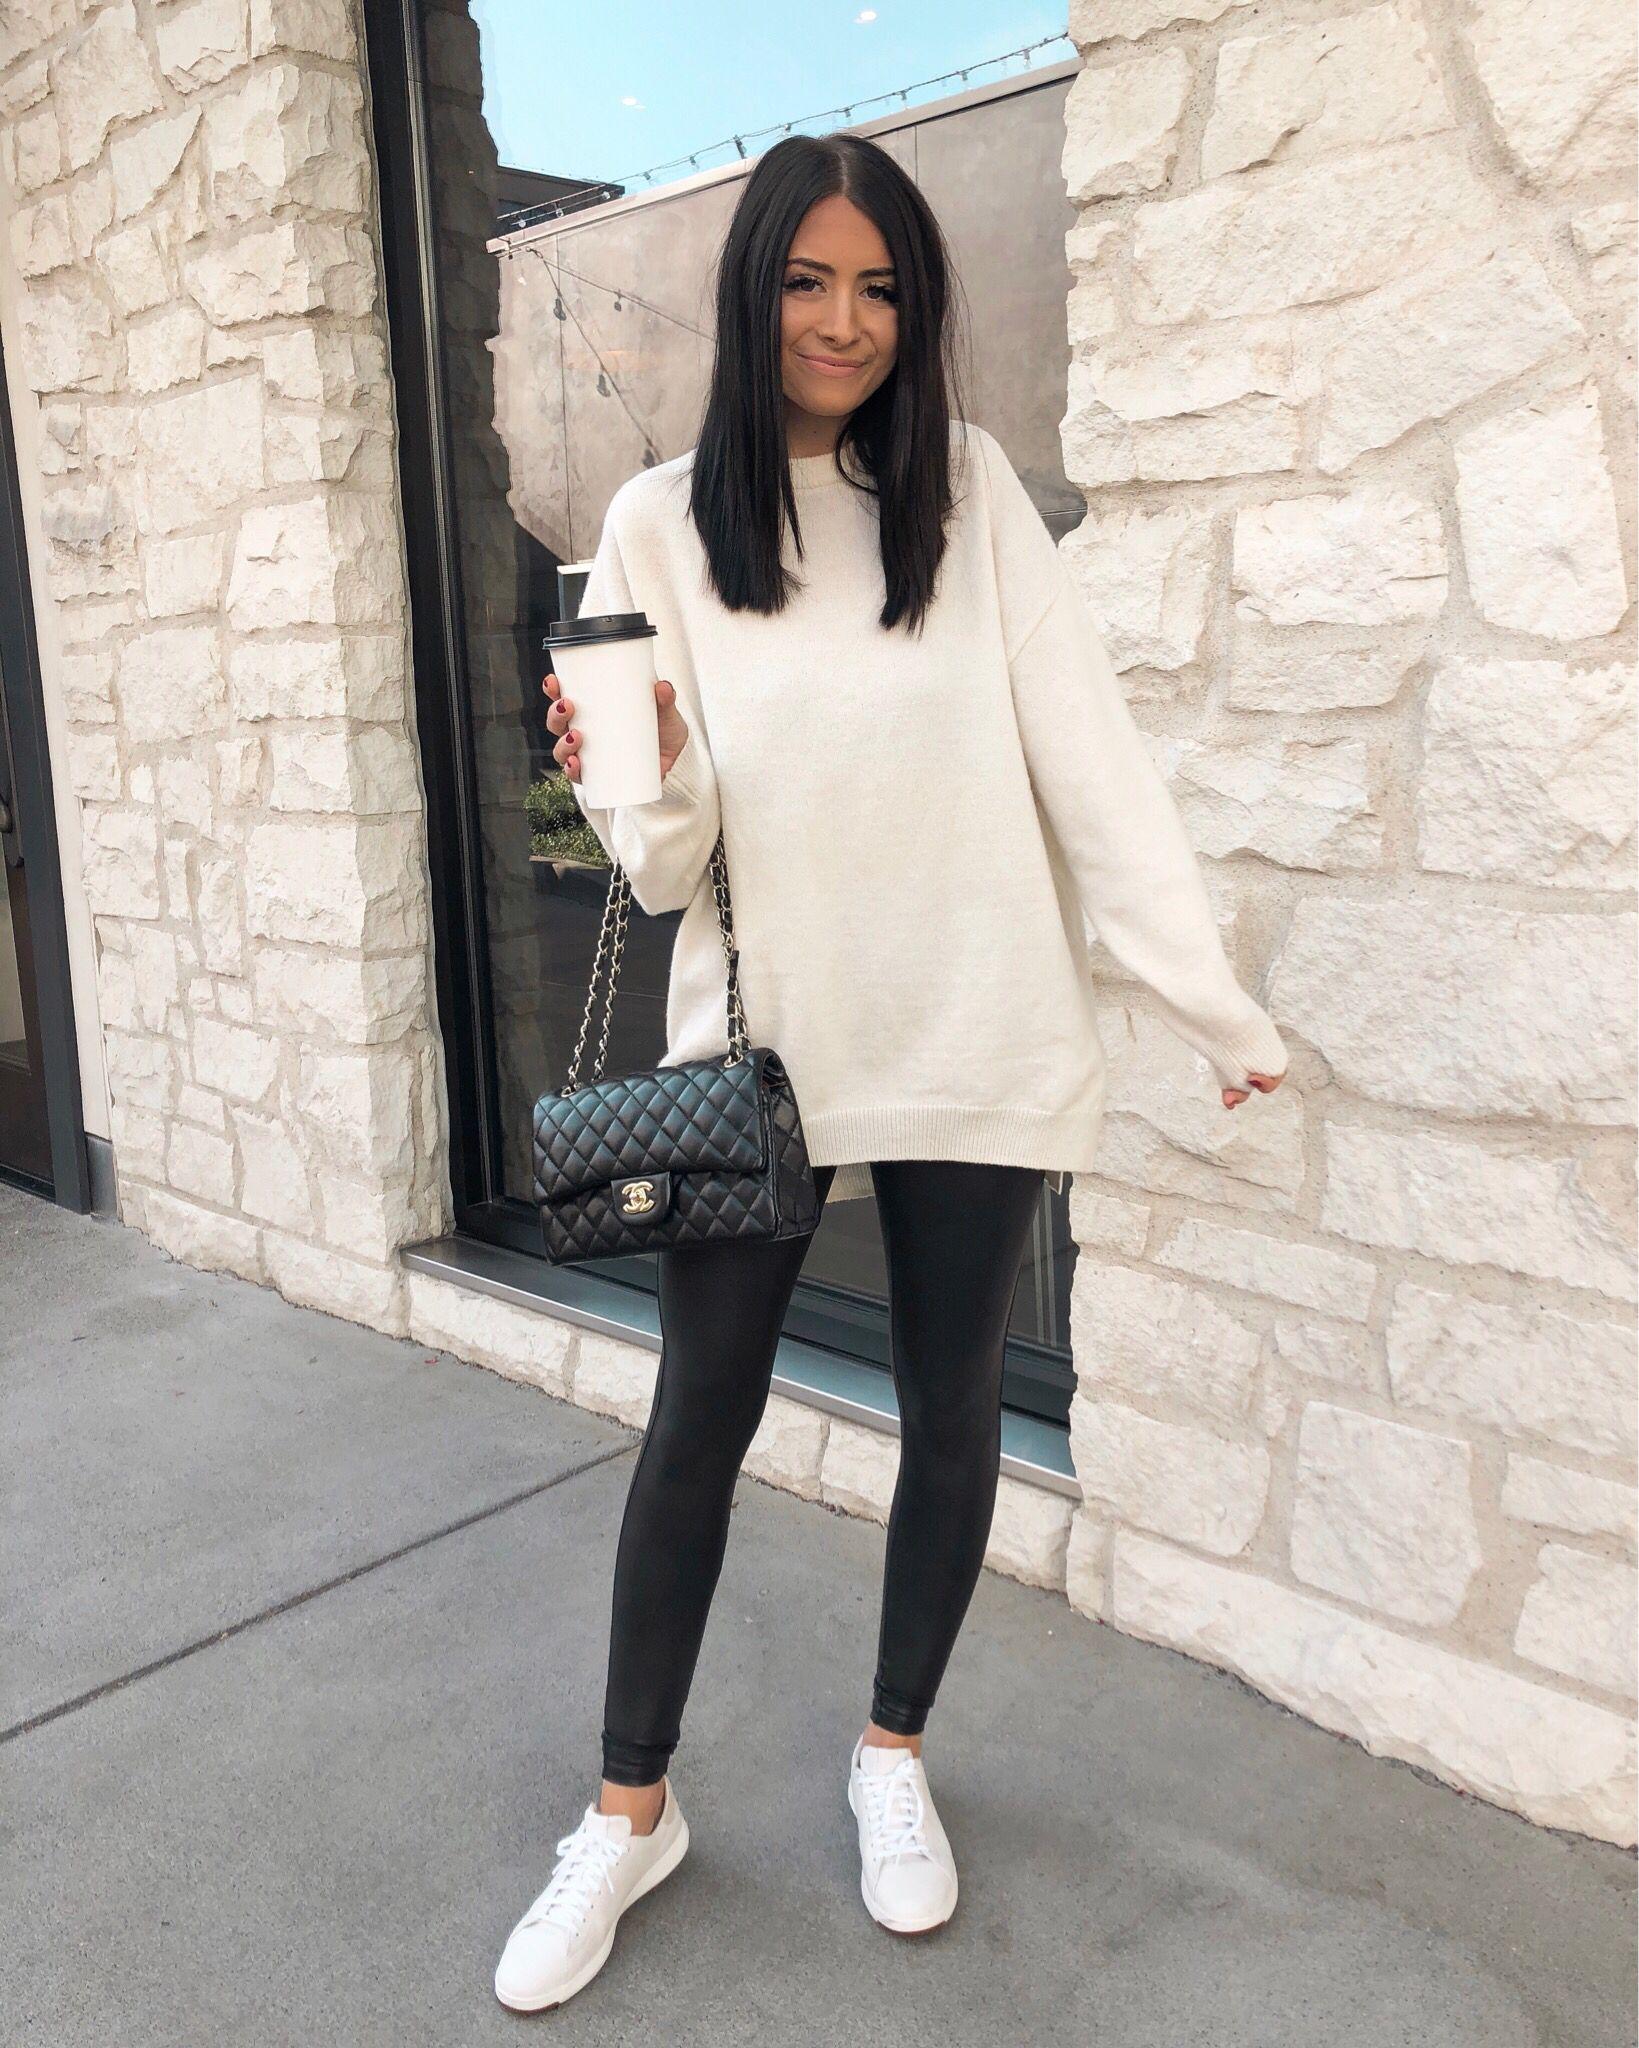 Boho Winter Outfits Cute: Winter Inspo / Fall Outfits